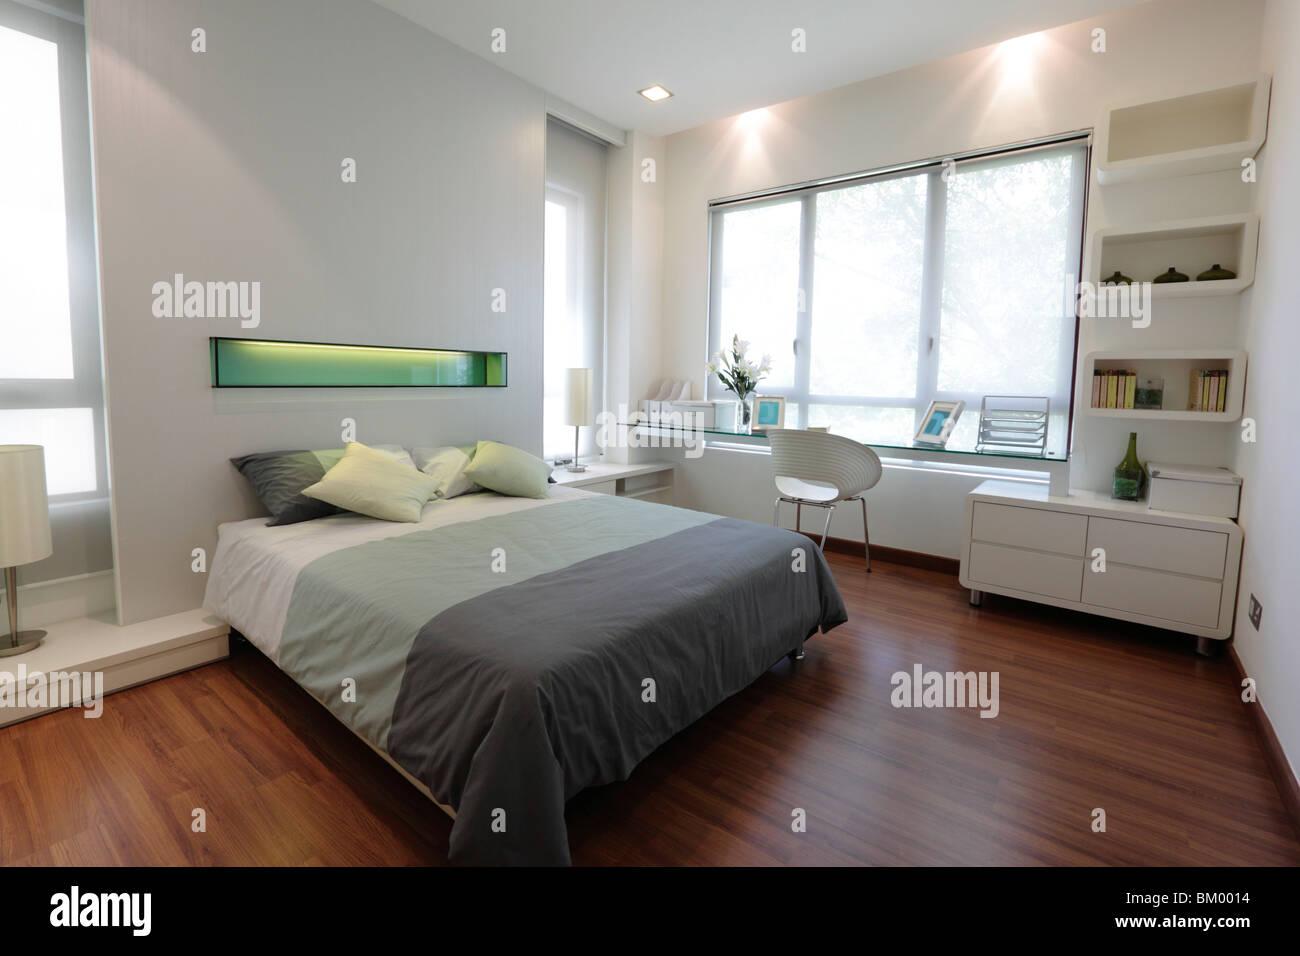 Vista de un dormitorio moderno Imagen De Stock